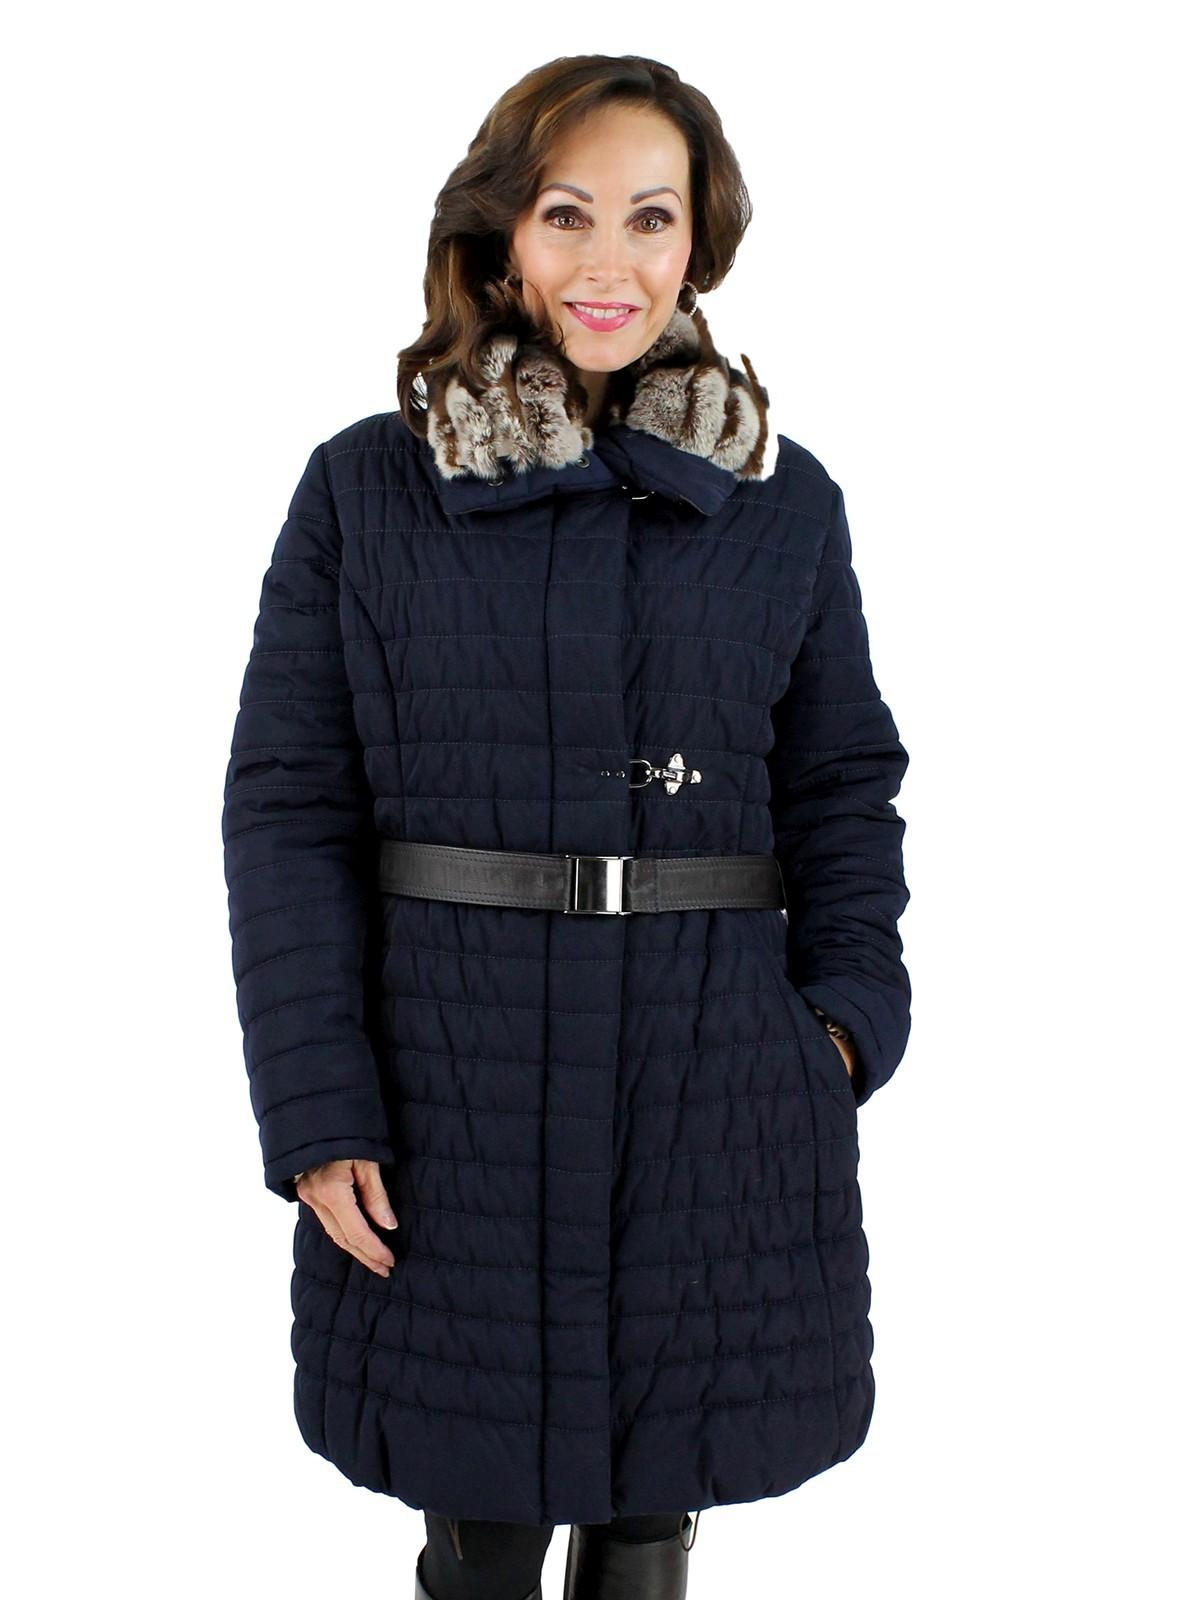 Gorski Navy Woman's Apres-Ski Coat with Dyed Brown Rabbit Collar